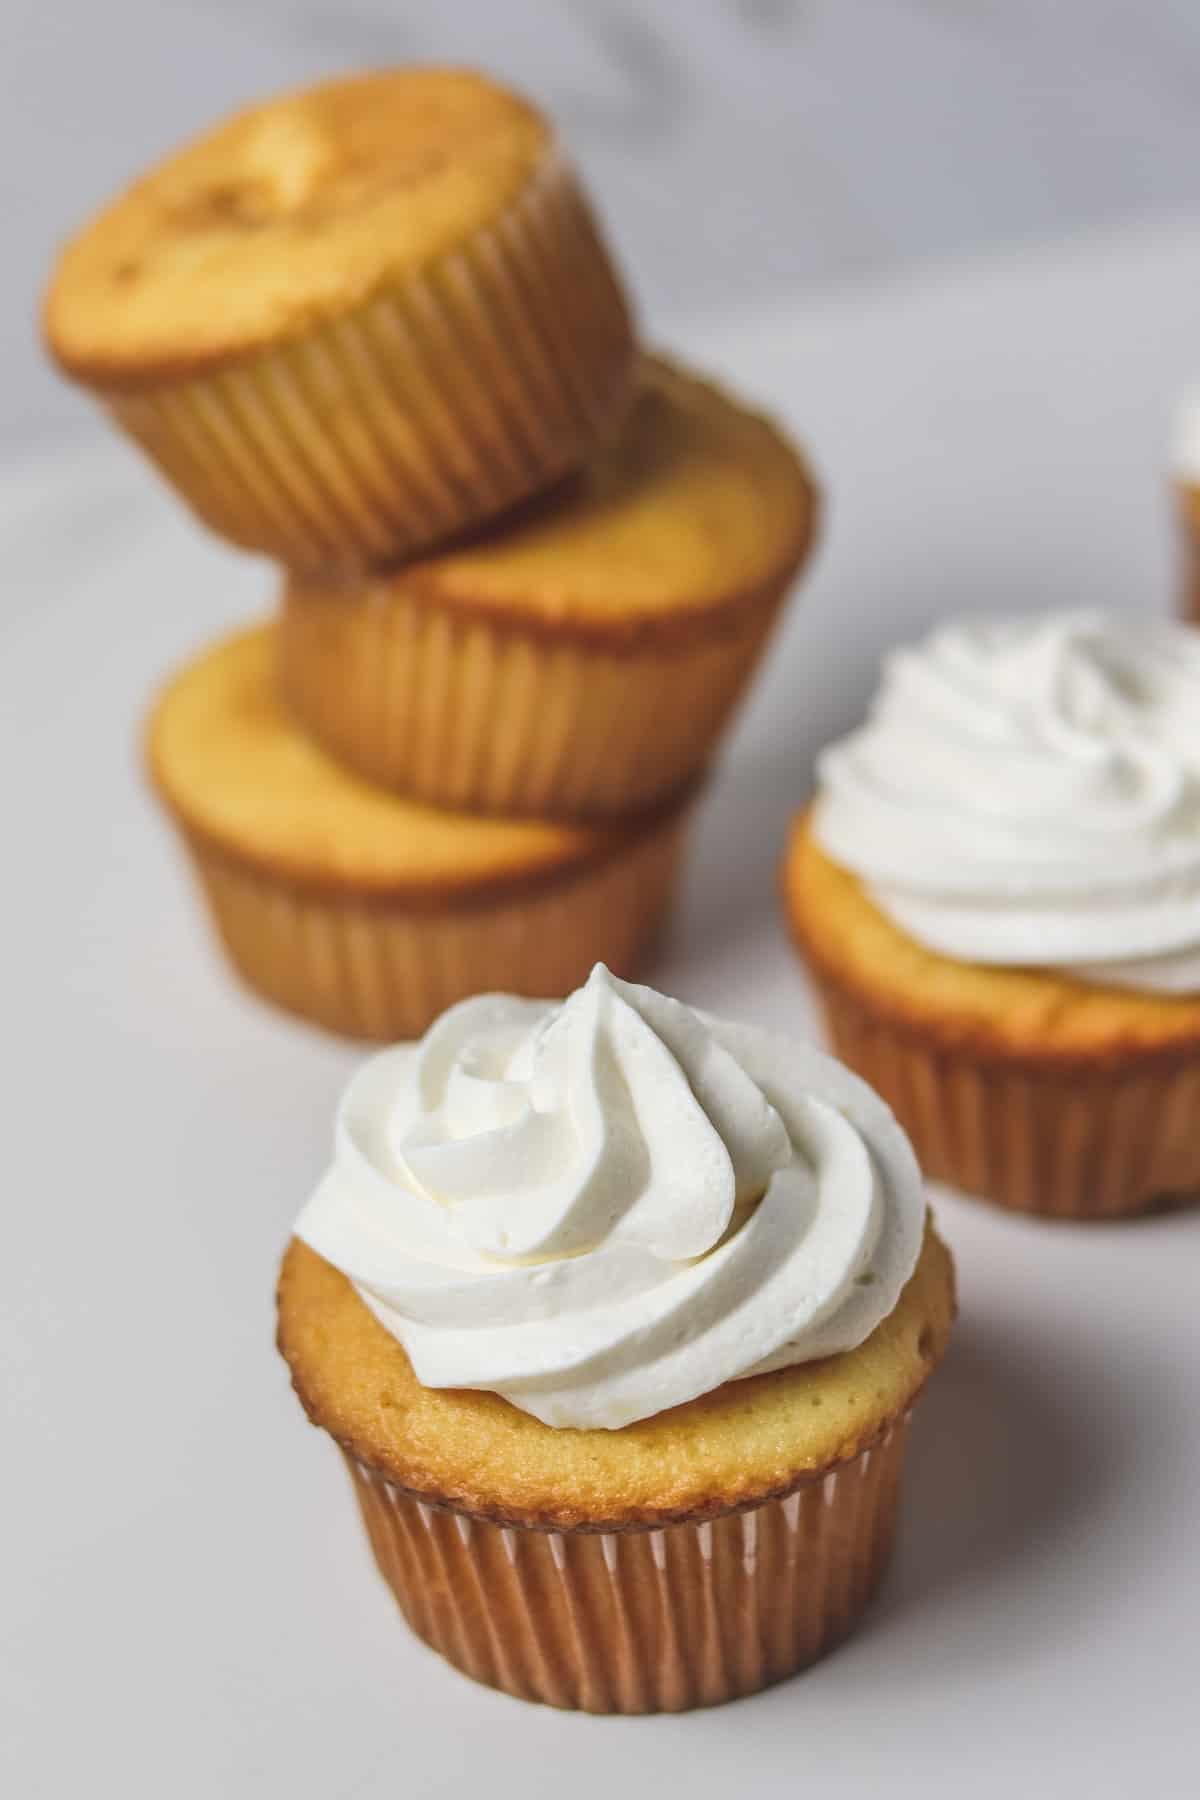 sugar-free keto frosting on a vanilla cupcake